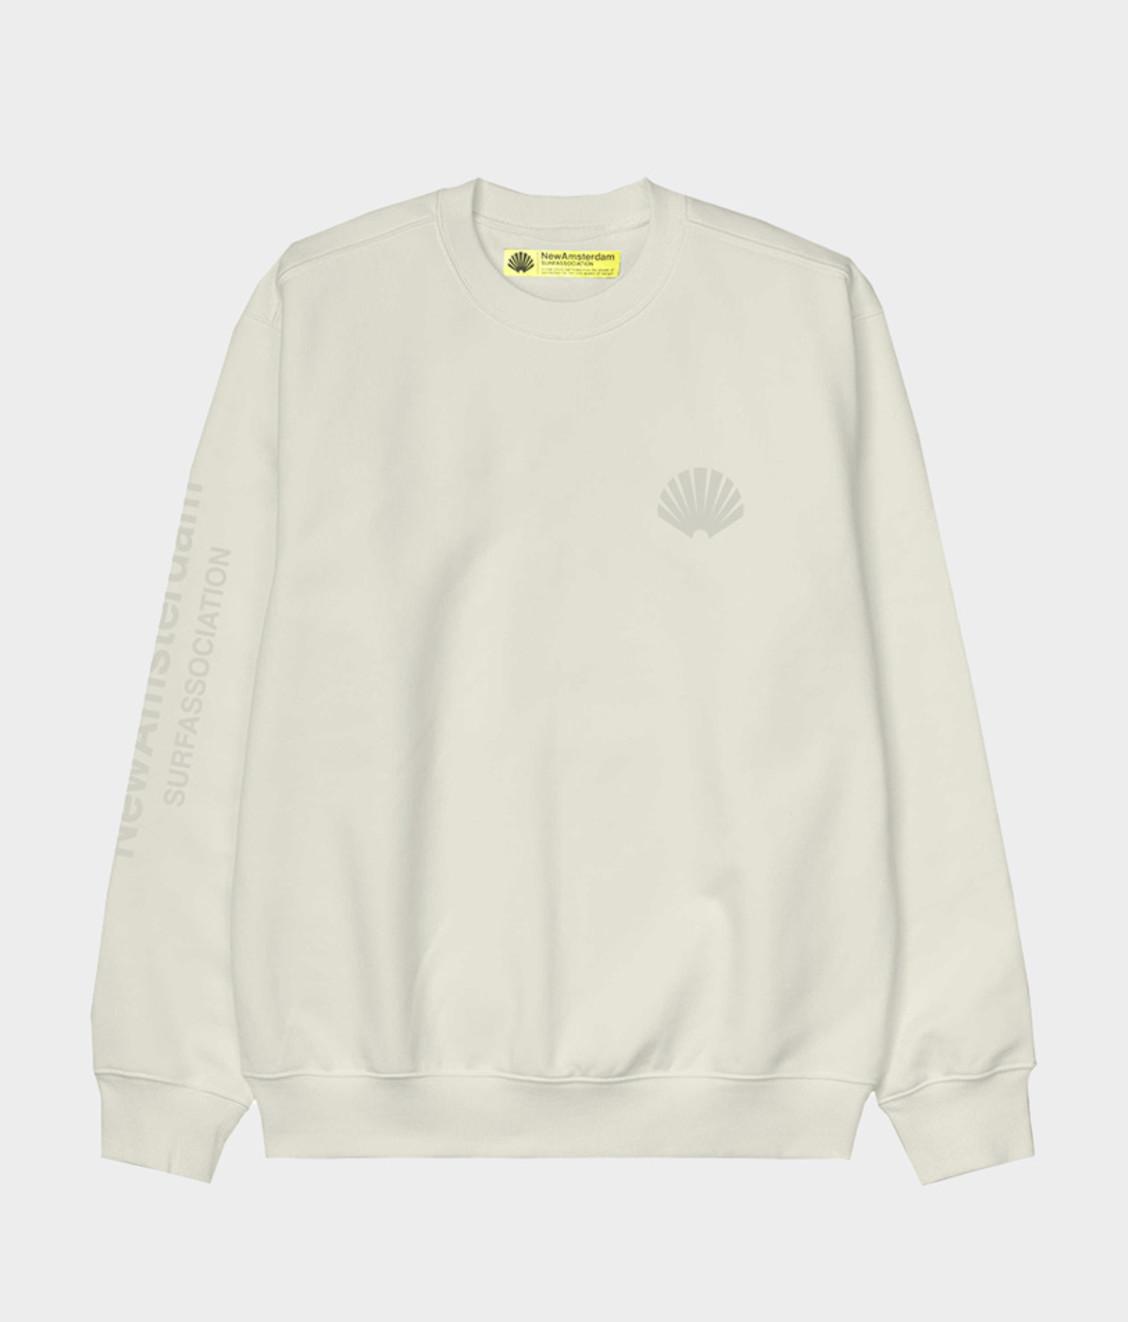 New Amsterdam New Amsterdam Logo Sweater Offwhite